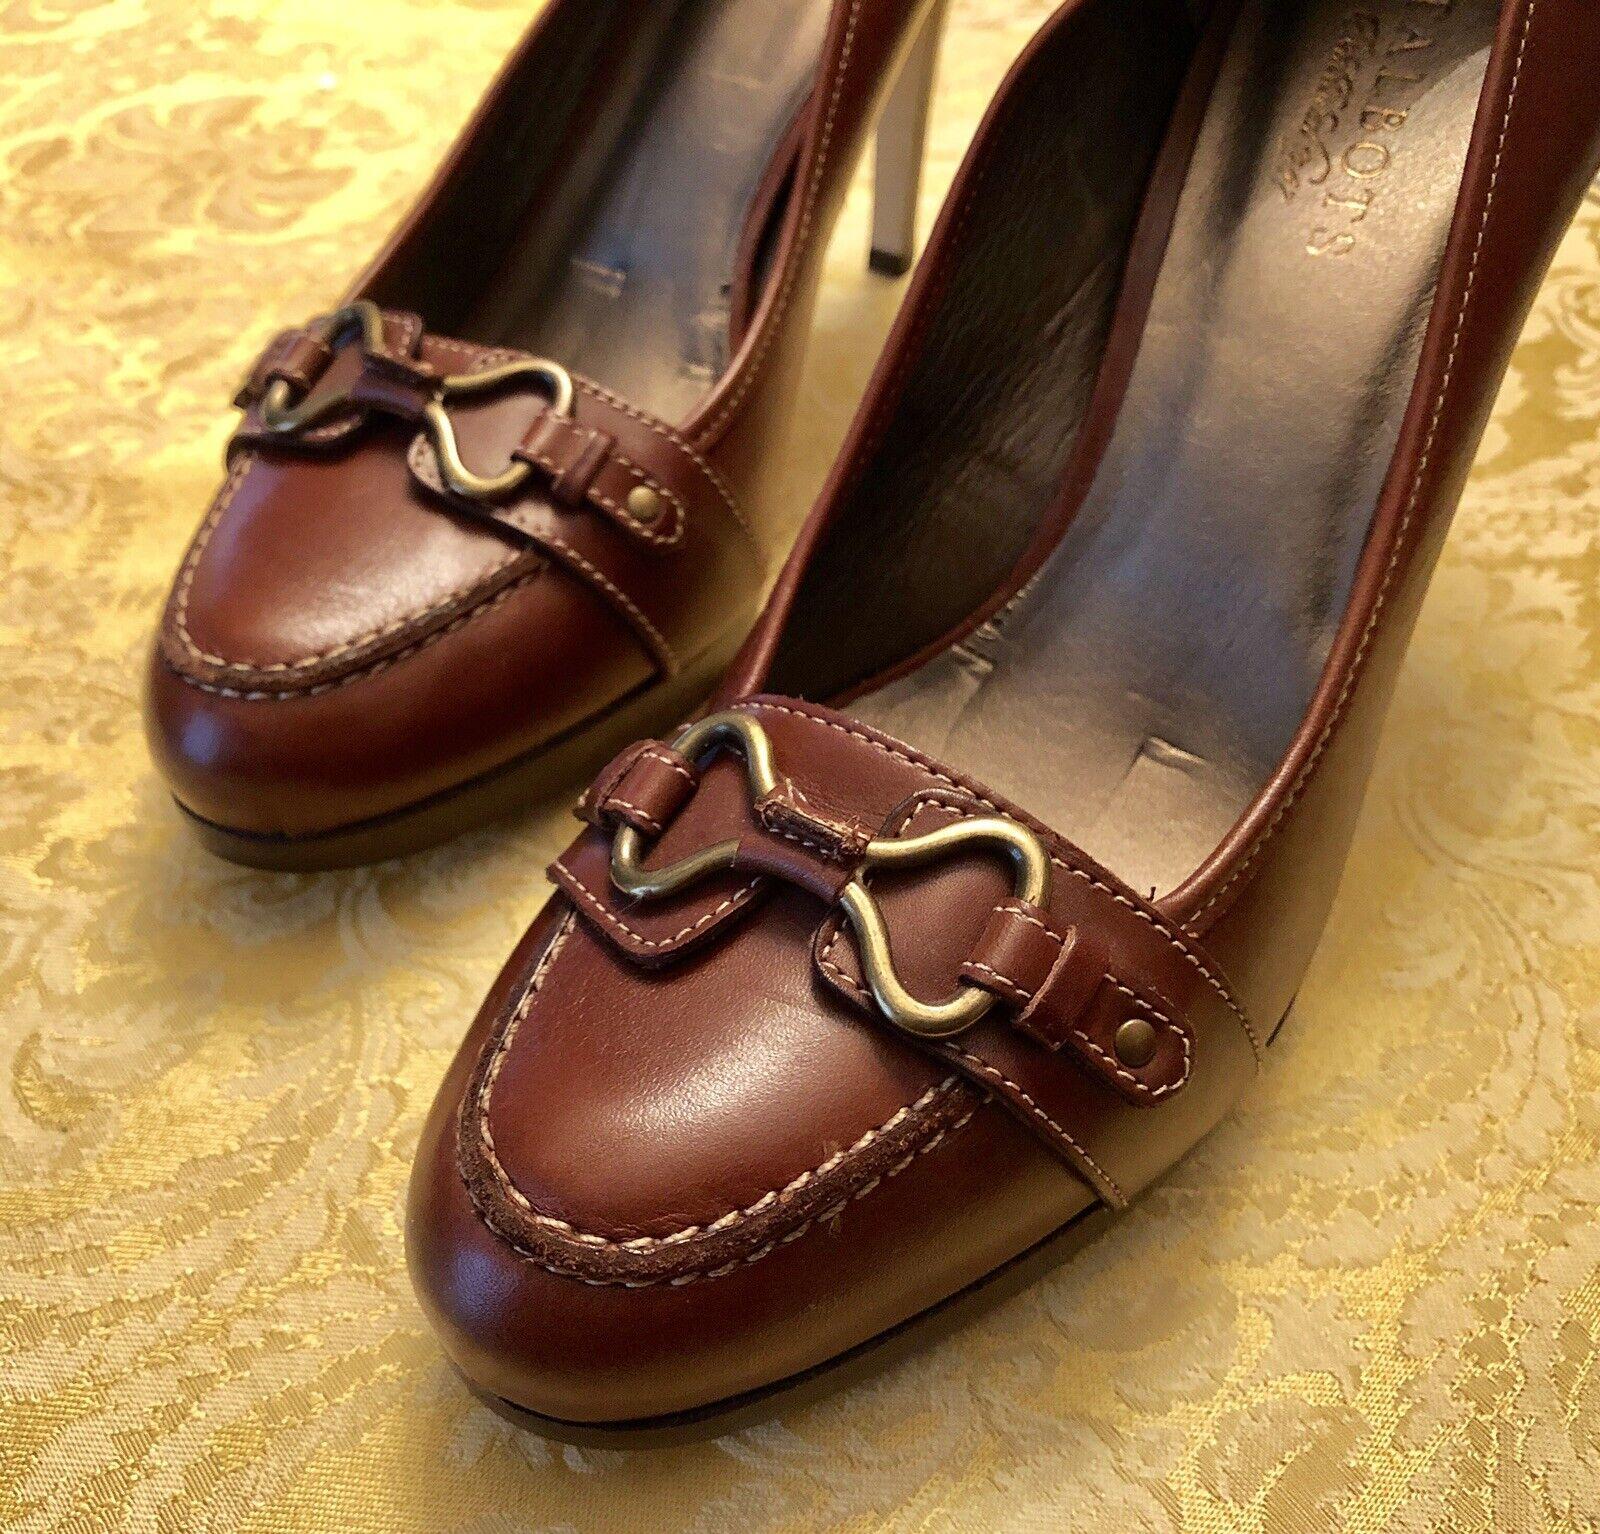 TALBOTS WOMEN'S SHOES Size 10B ADELE-M Burnished Cognac Orig. Brand-New!